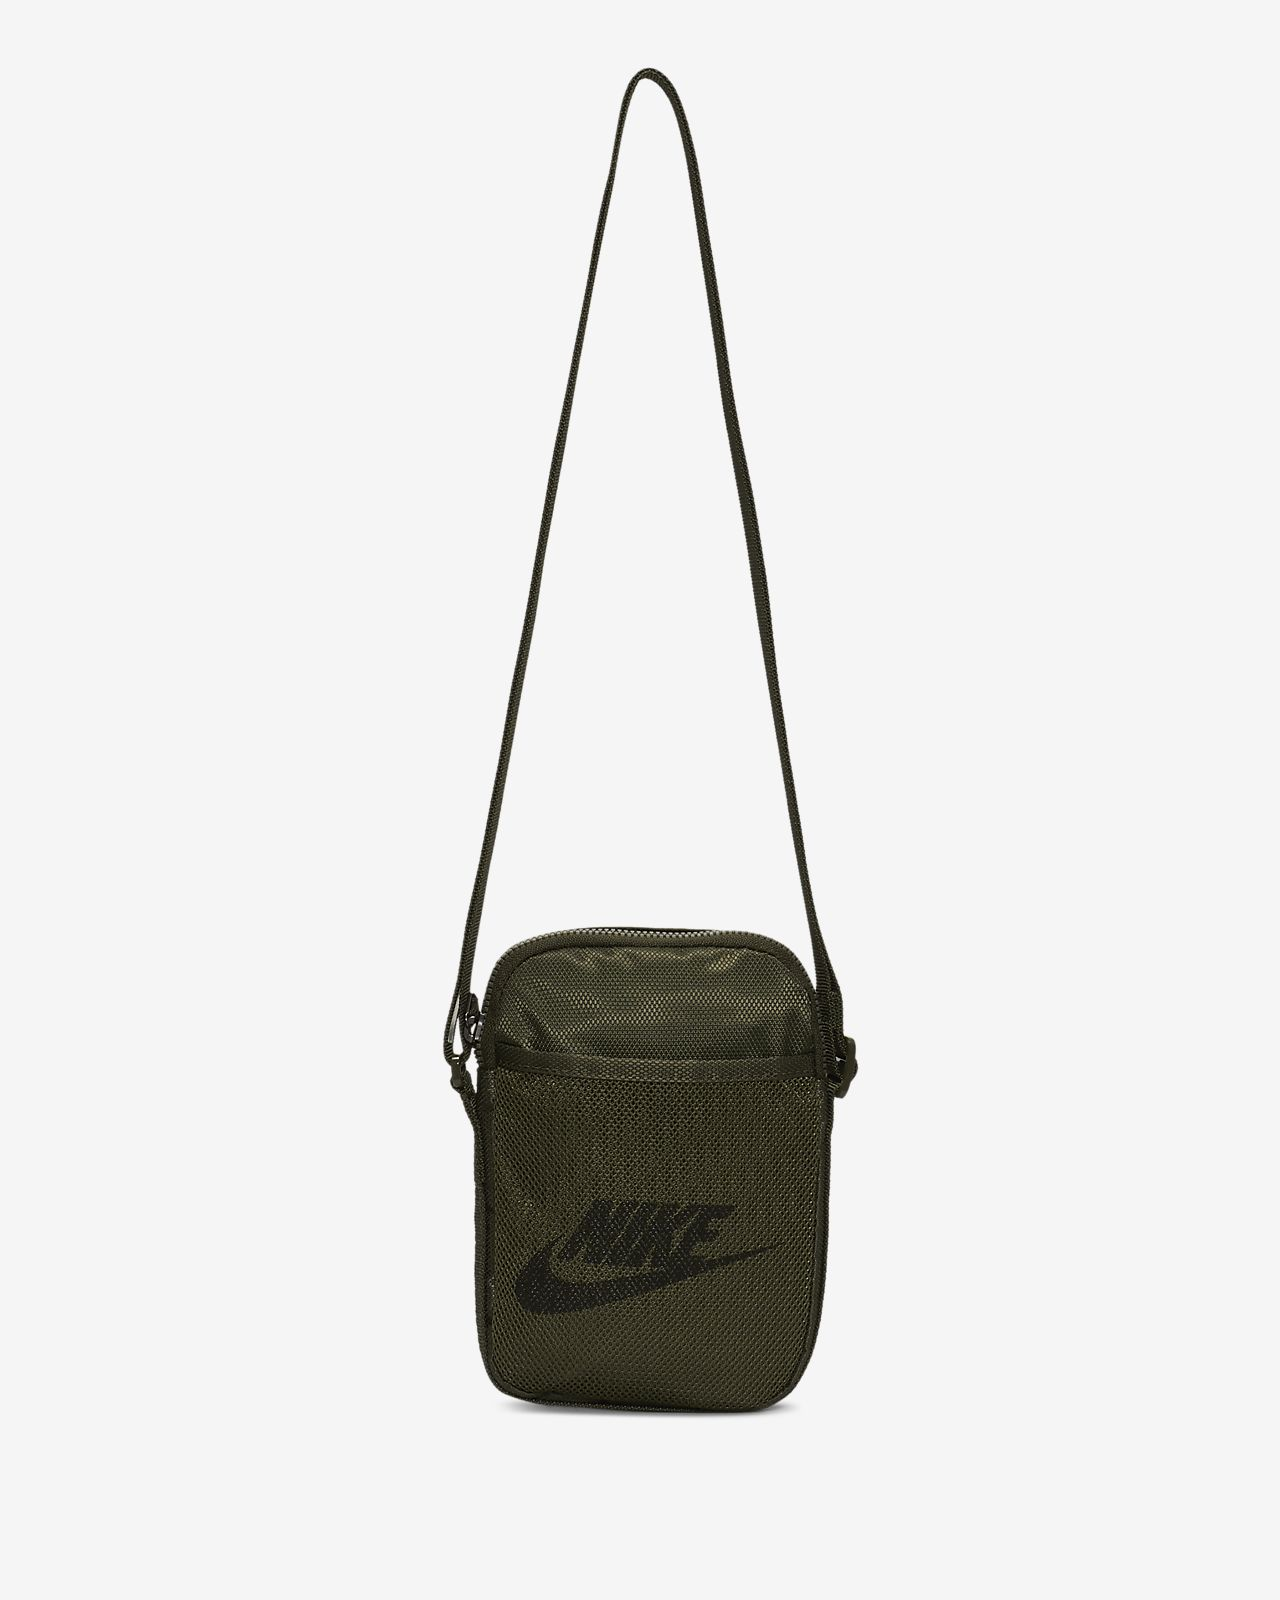 Sac à bandoulière Nike Heritage (petite taille)